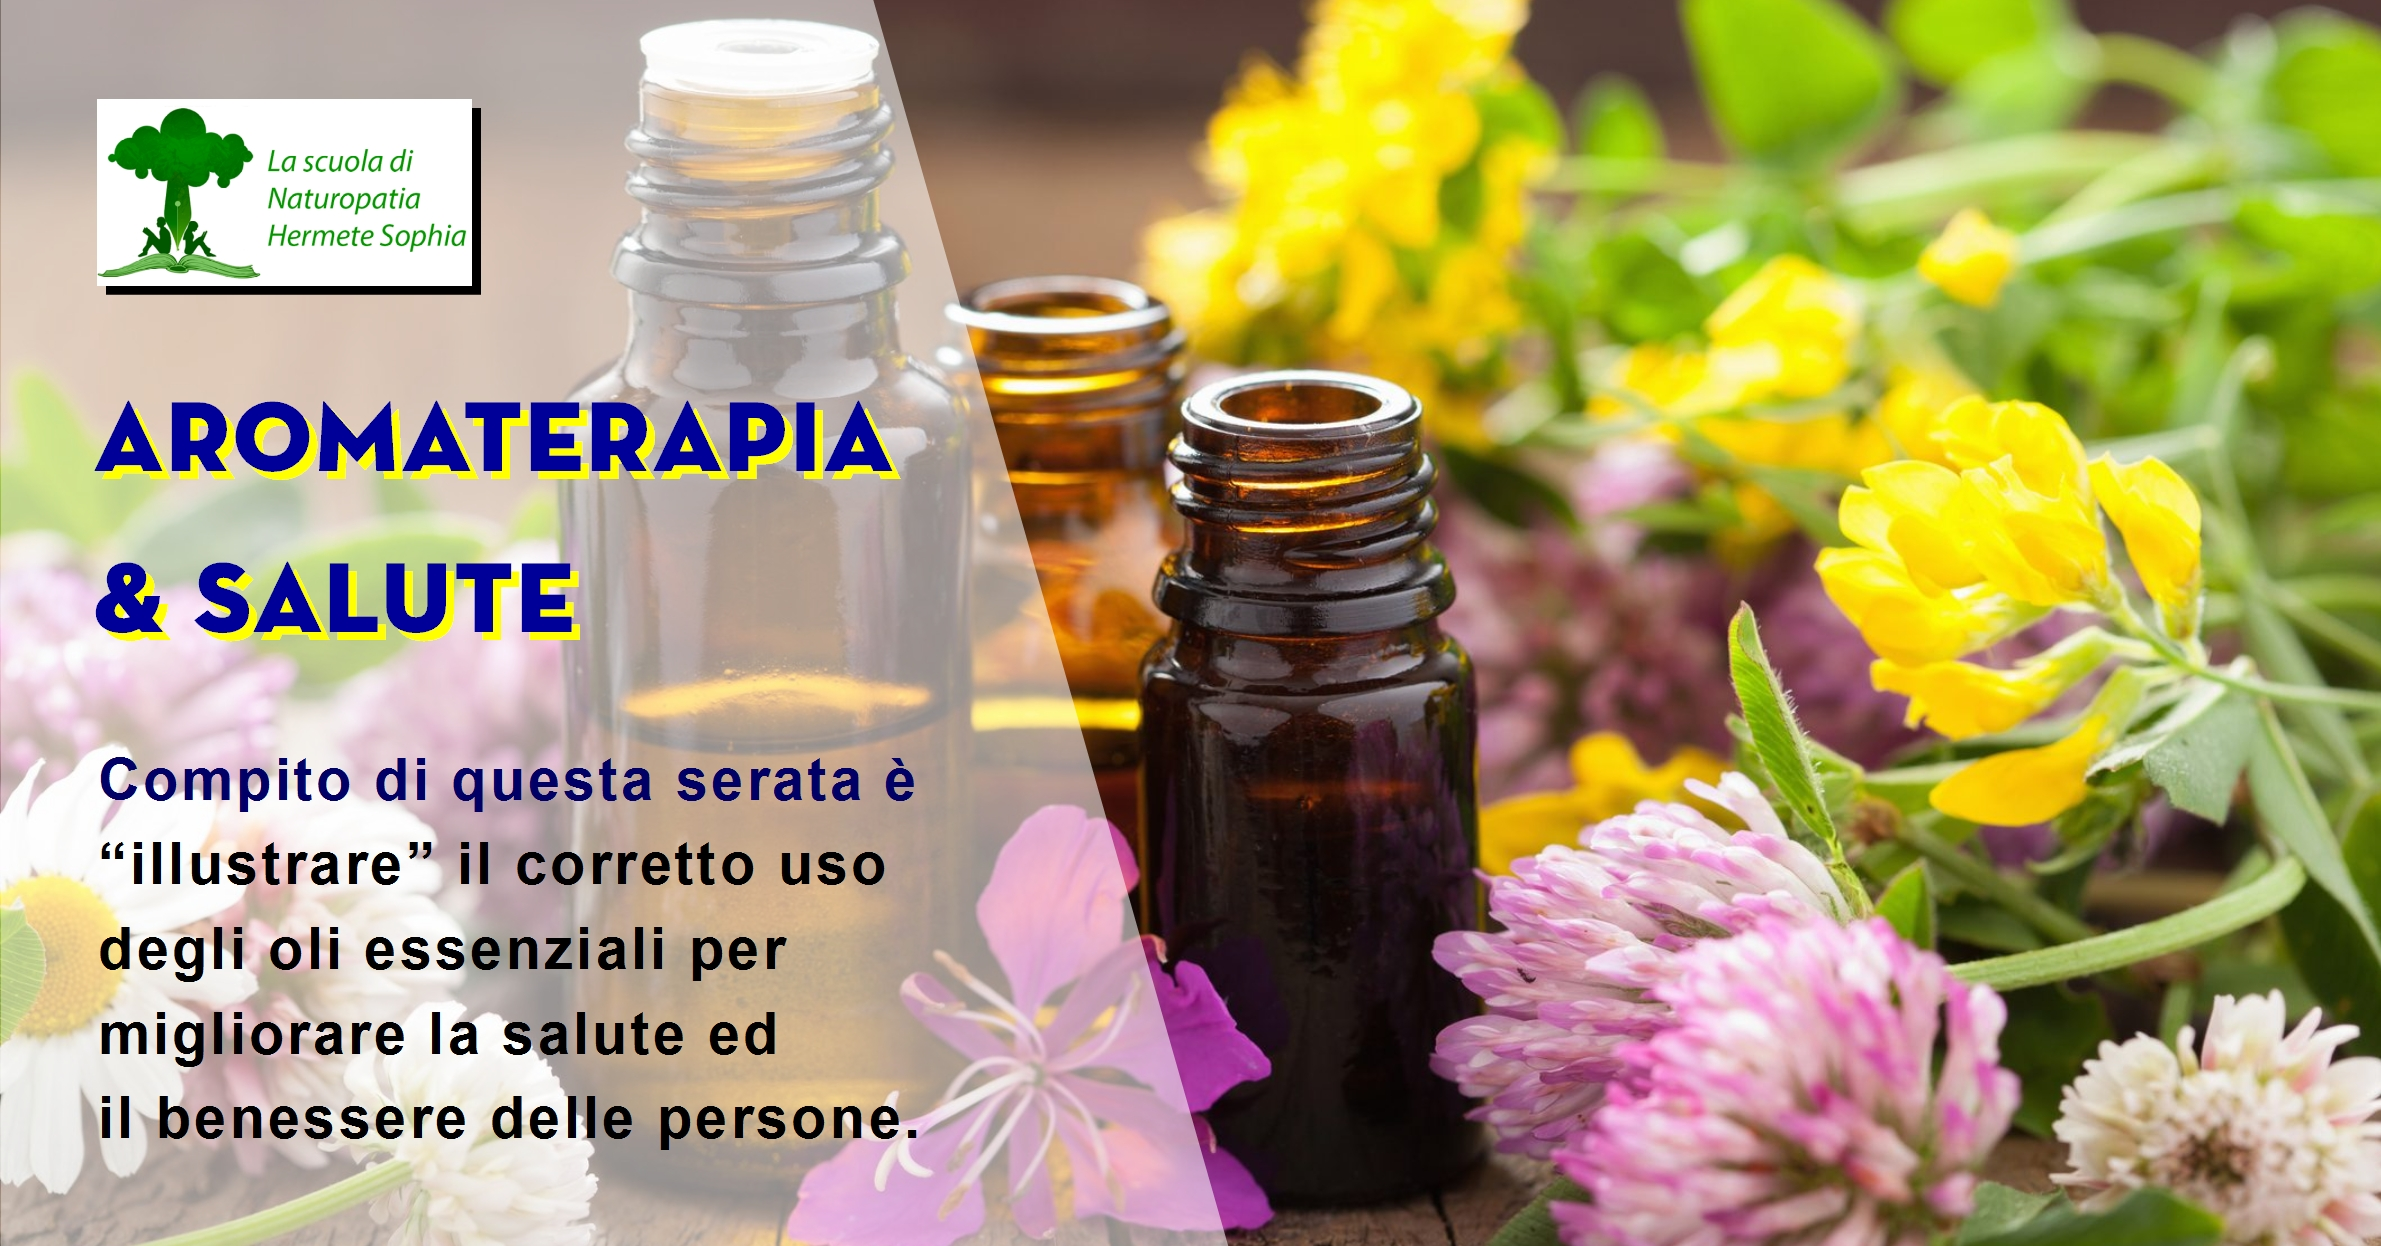 aromaterapia & salute